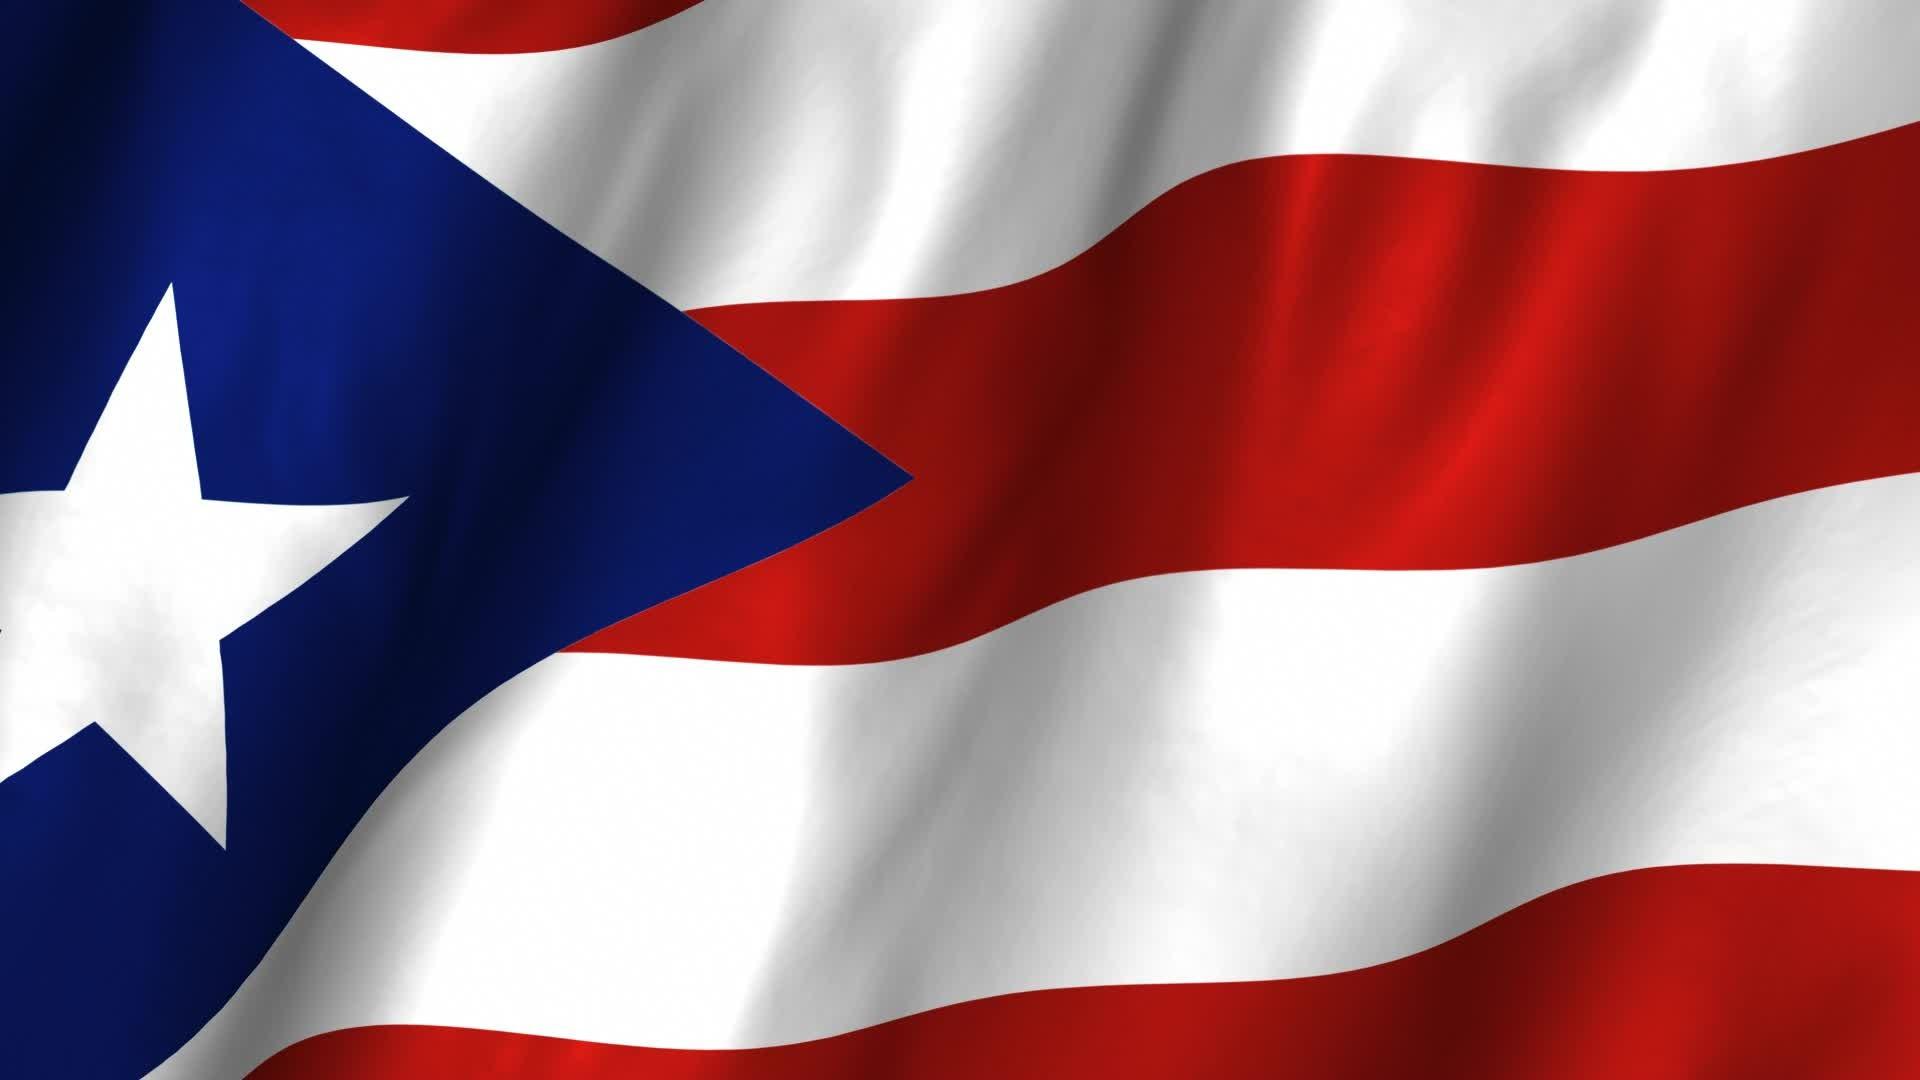 Puerto Rico Flag Desktop Wallpaper 50702 px .